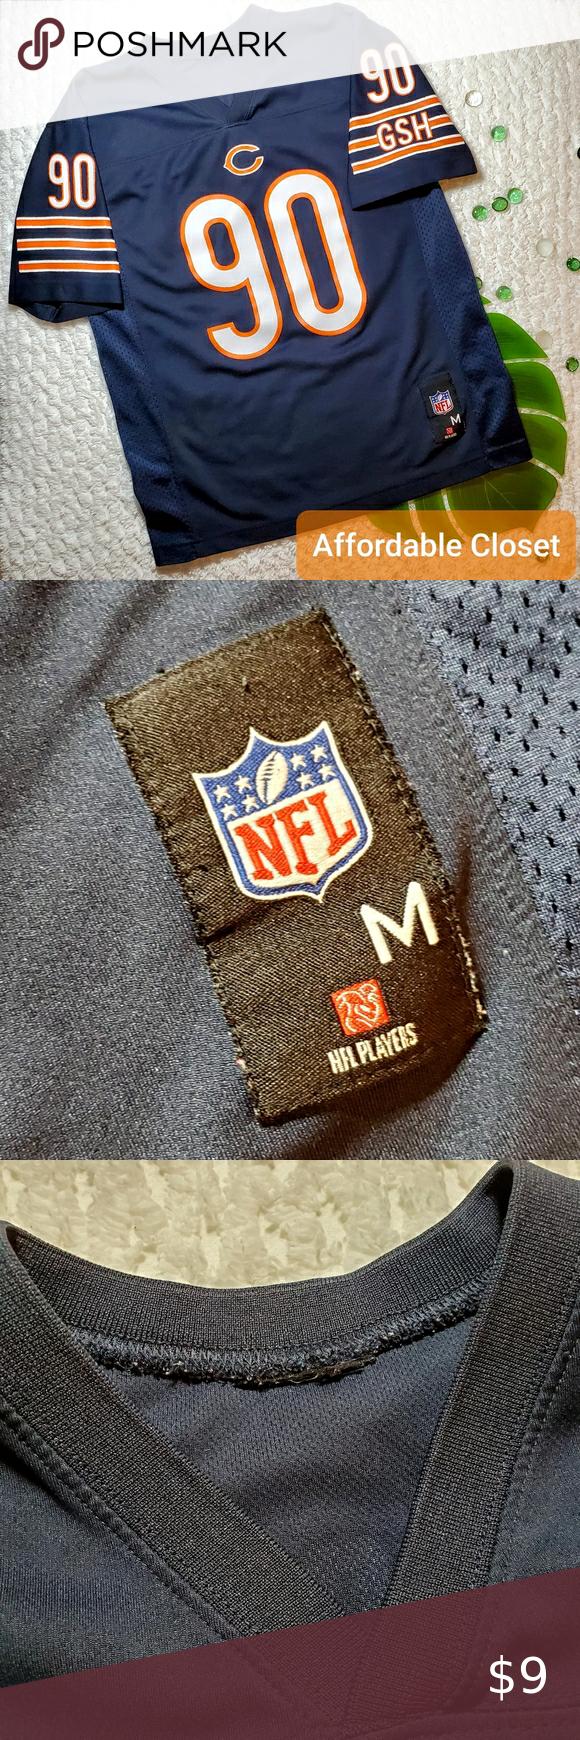 5 for $10 *** ○ Youth NFL Jersey ○ | Nfl shirts, Nfl jerseys ...